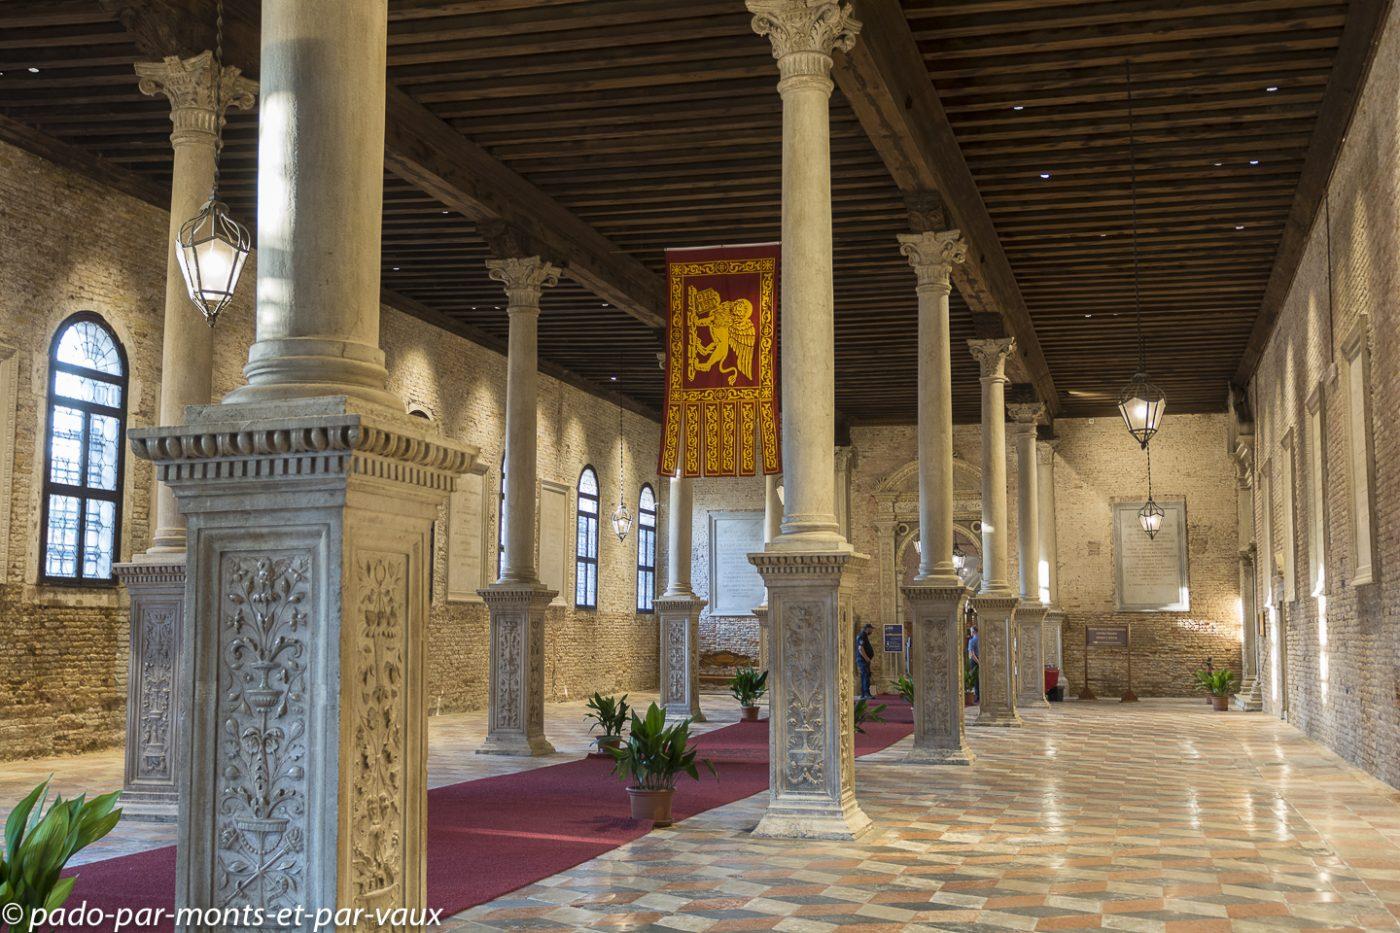 Venise - Scuola Grande de San Marco